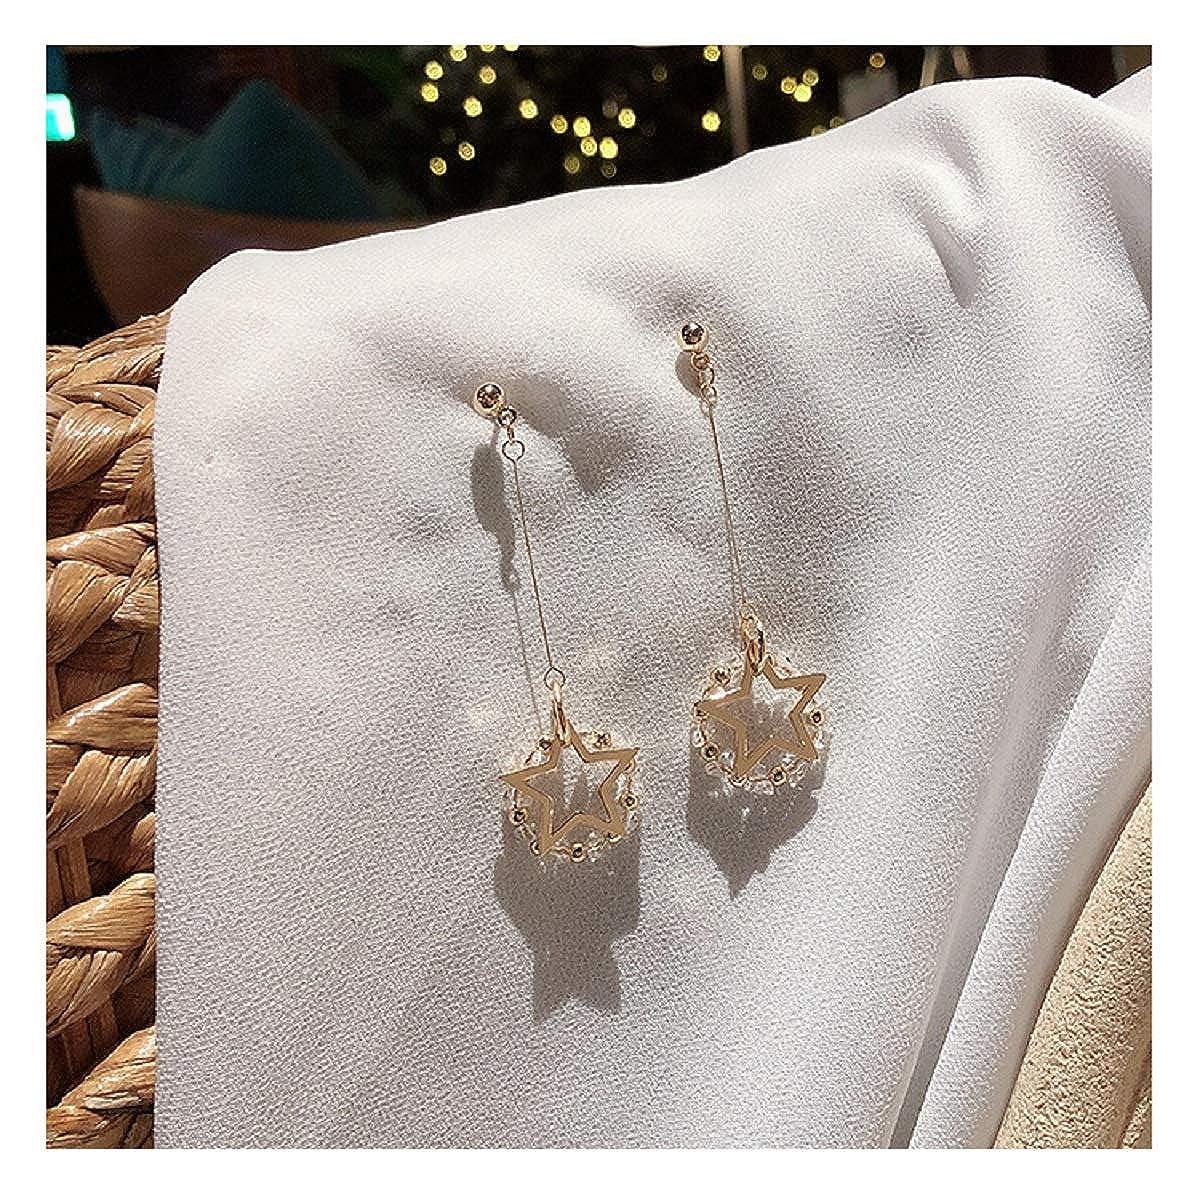 Fashion Simple Style Earring JXVLUYE Colors Earring for Women Girls Crystal Tassel Great Gifts for Women Girls